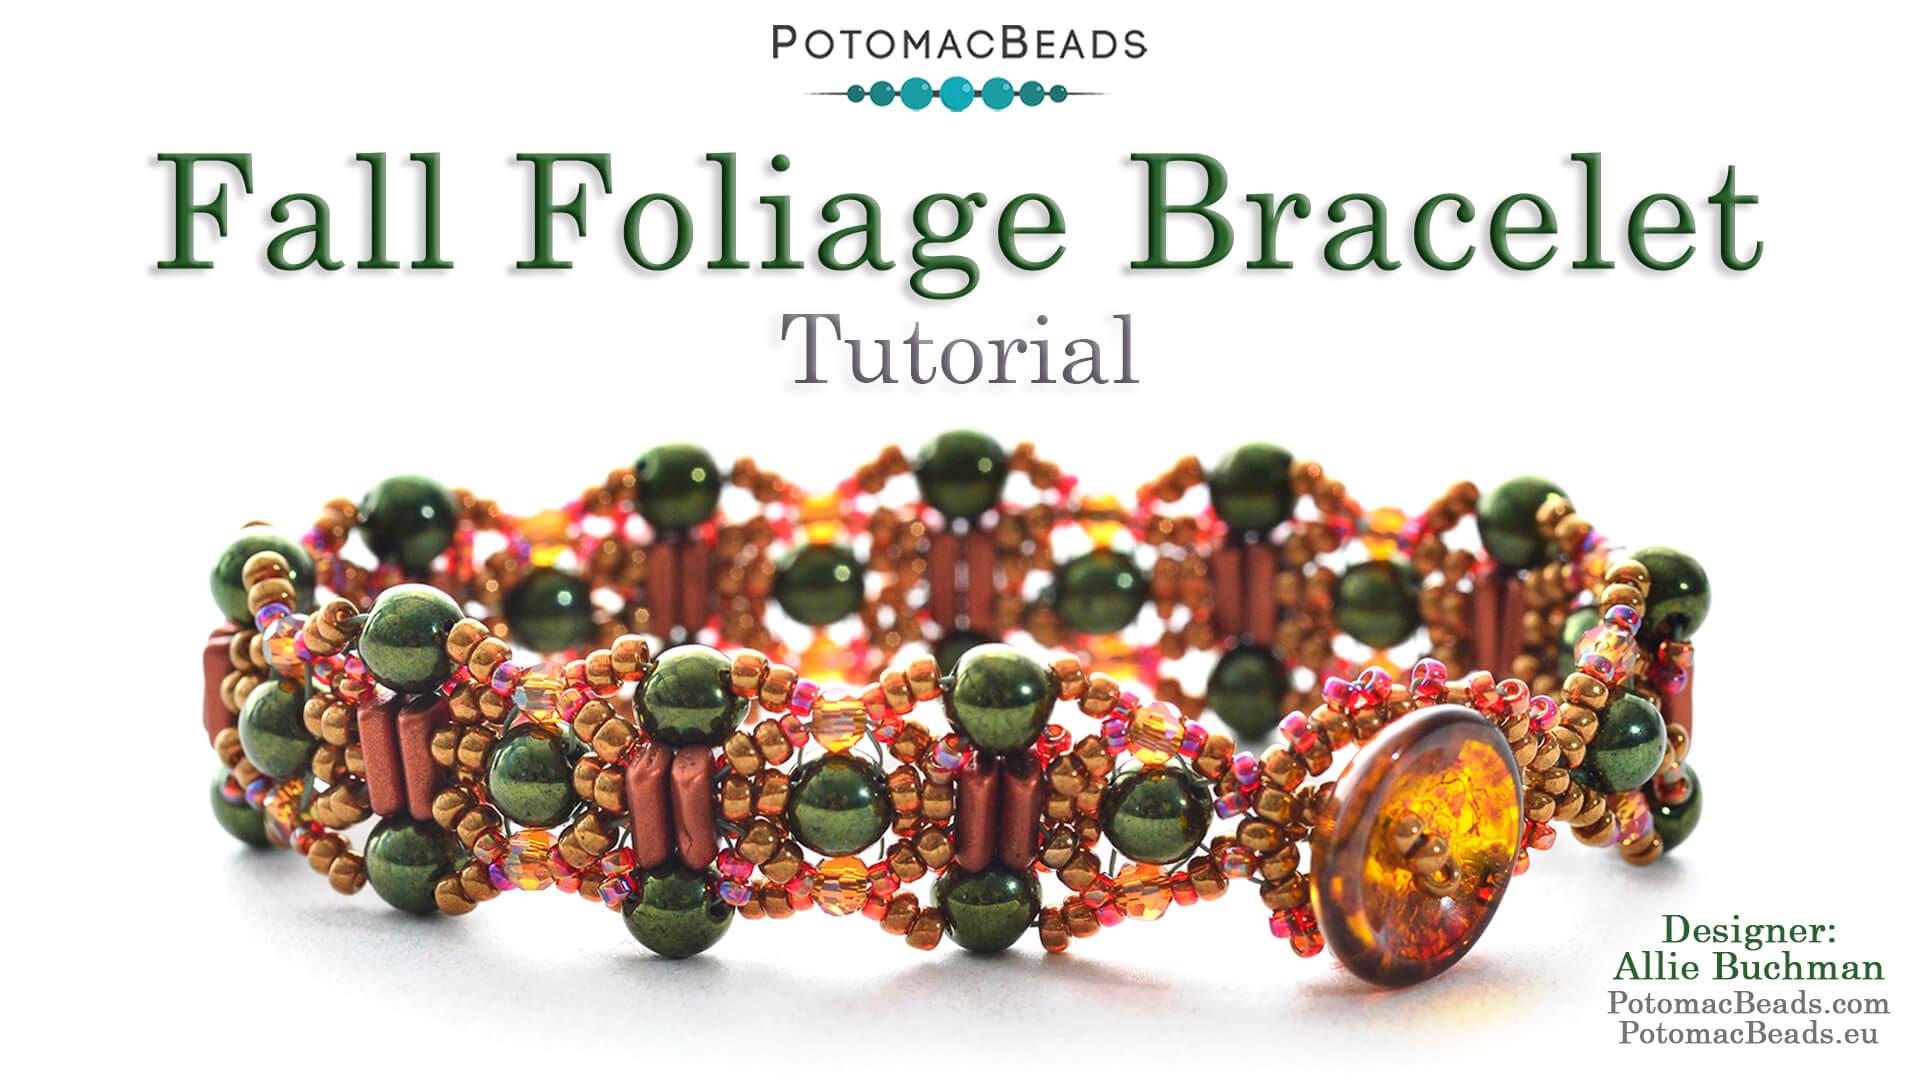 How to Bead Jewelry / Beading Tutorials & Jewel Making Videos / Bracelet Projects / Fall Foliage Bracelet Tutorial